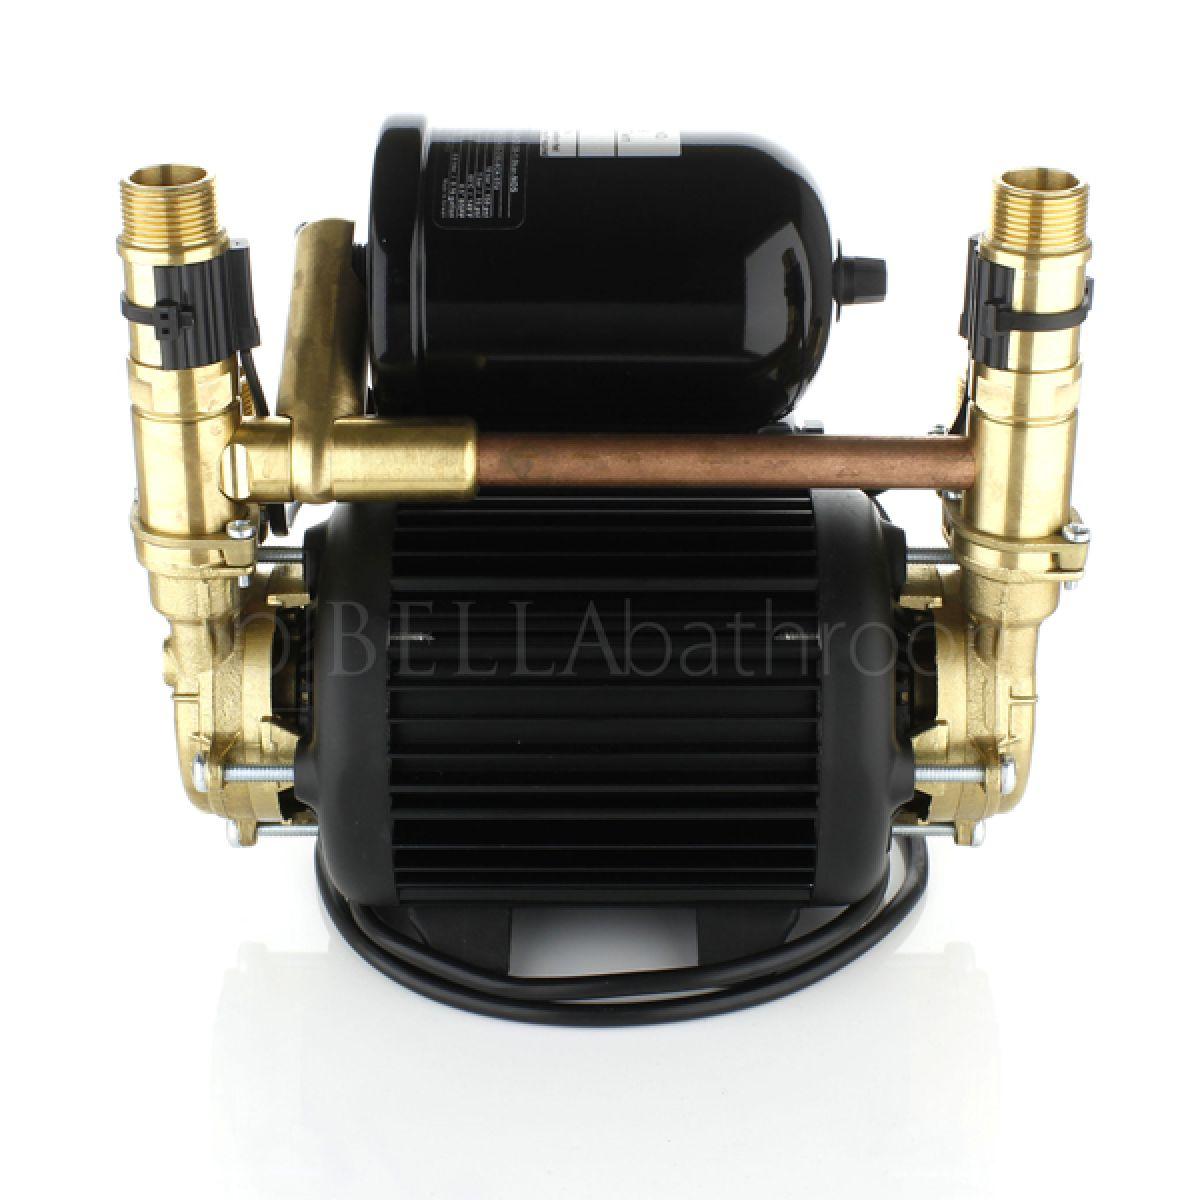 Stuart Turner 46480 Monsoon Universal Twin 2.0 Bar Negative Head Pump Back